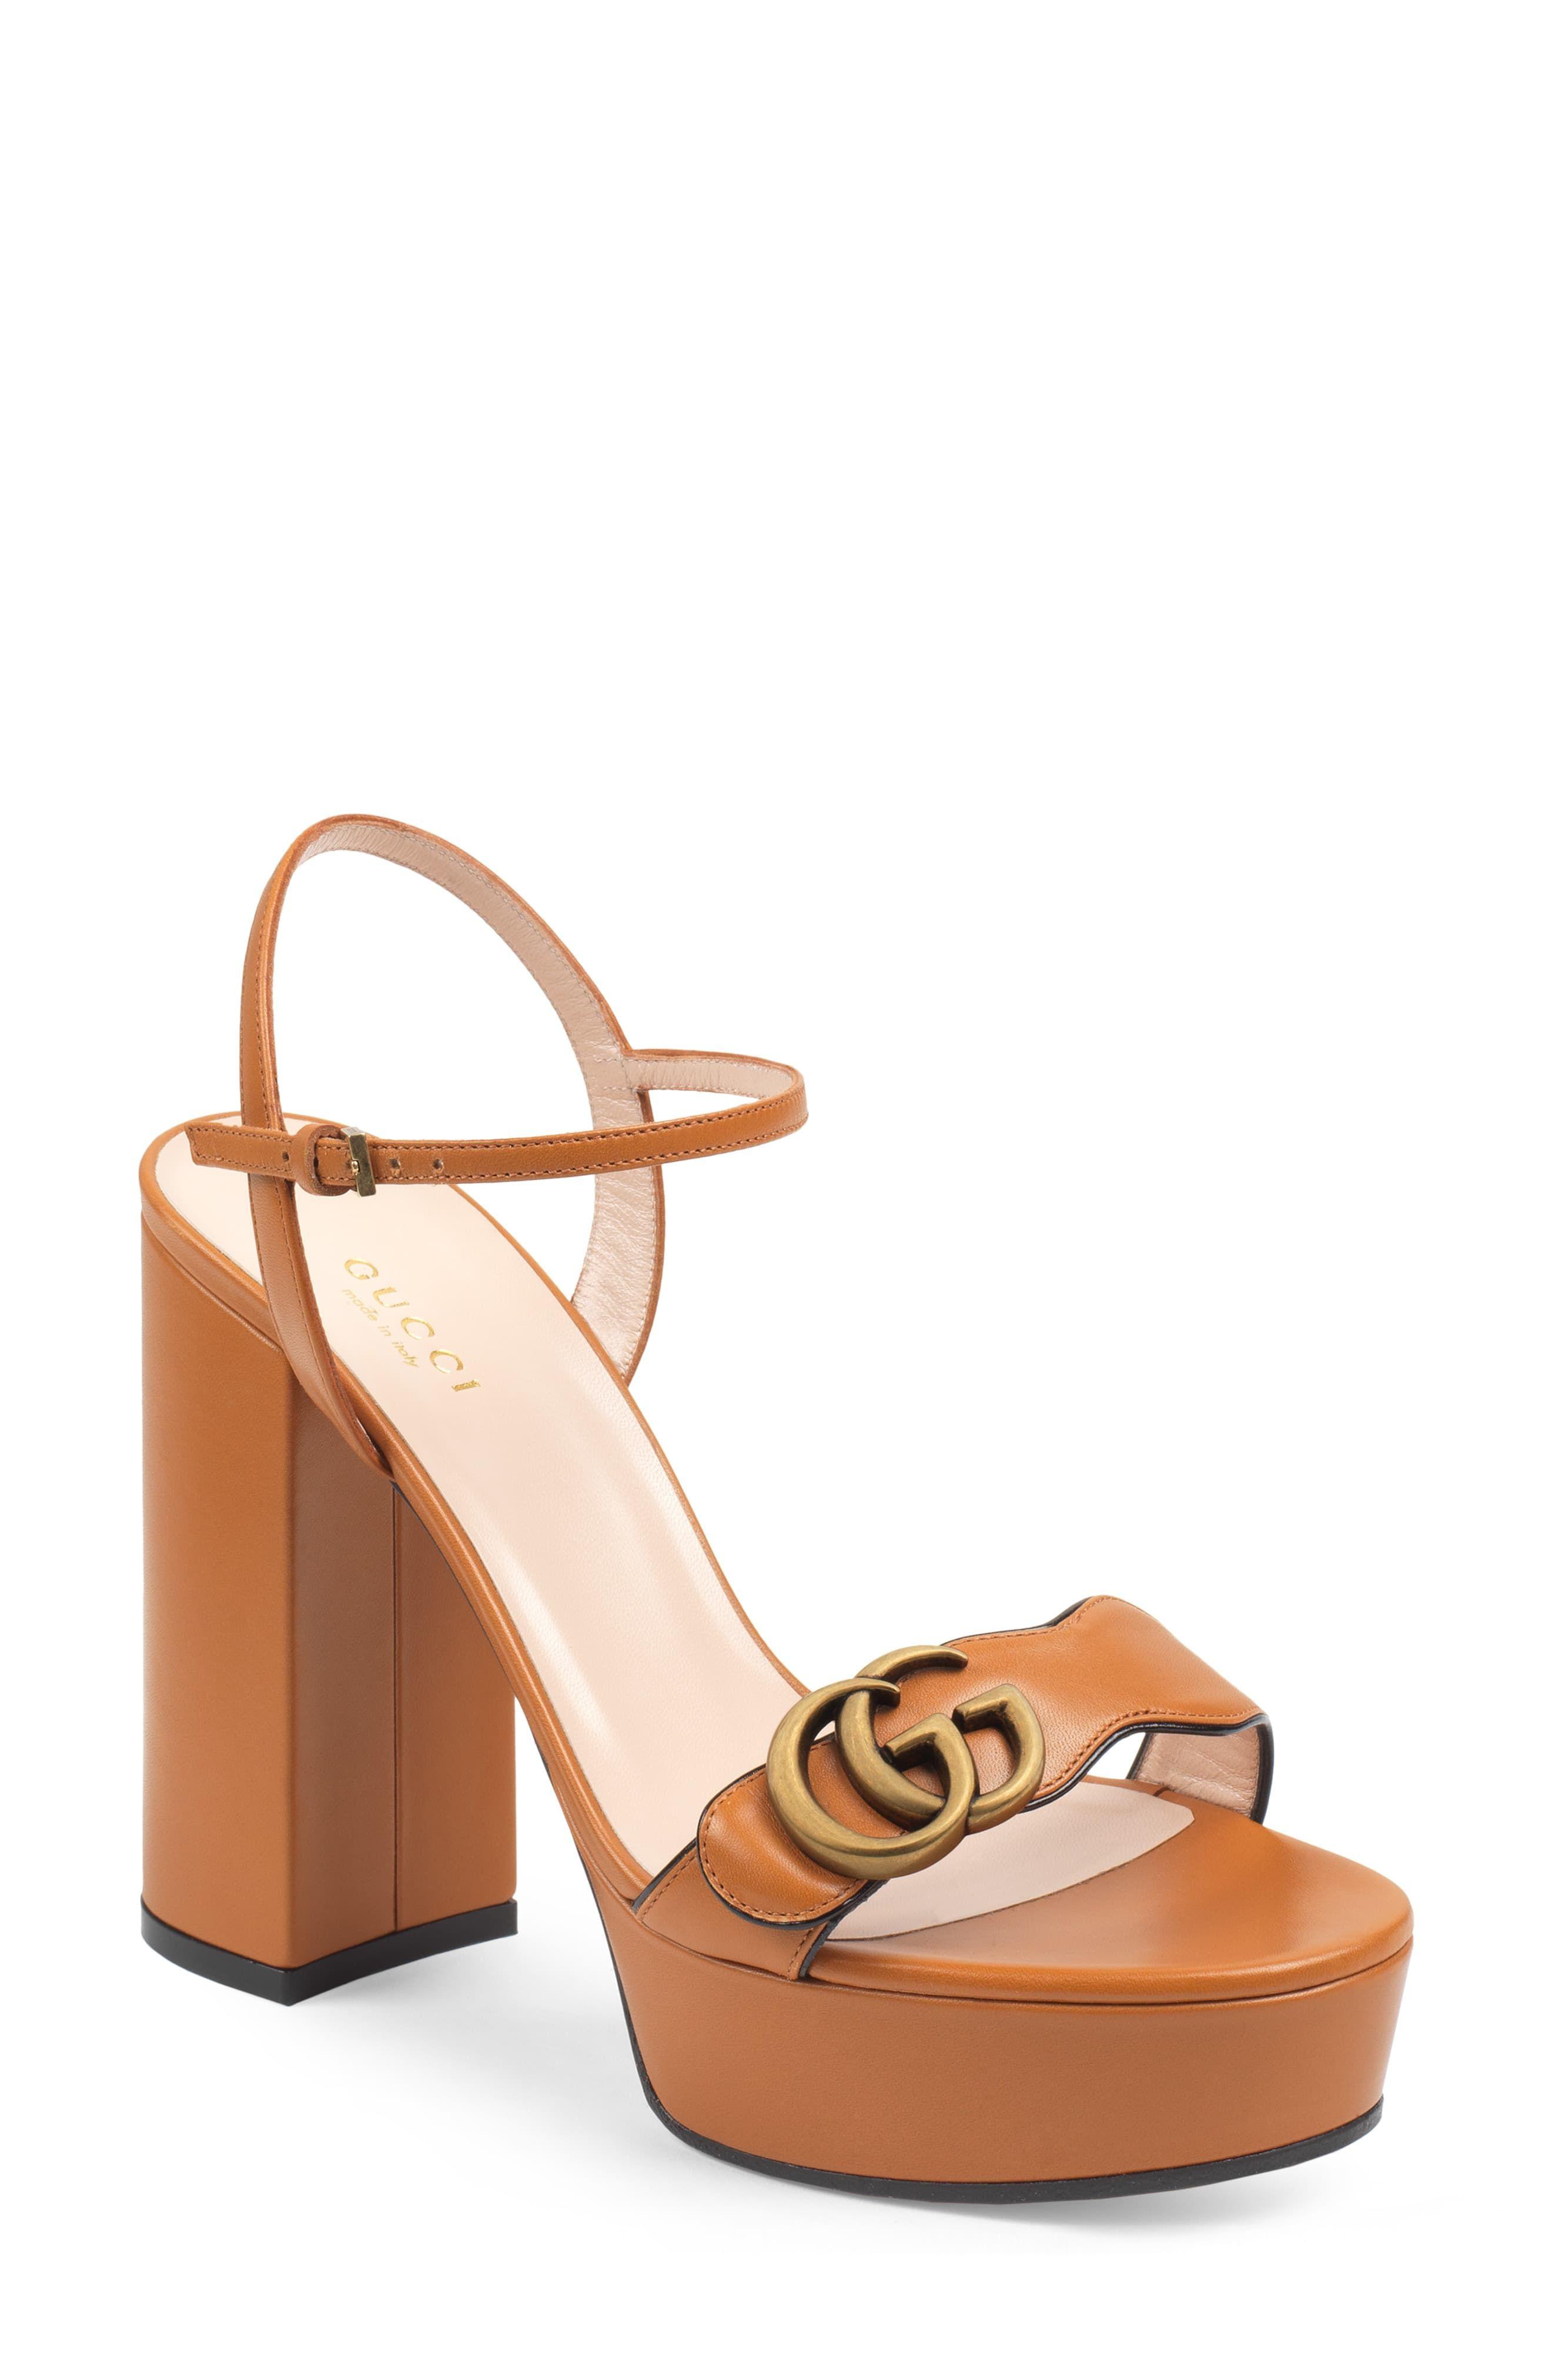 ccb45f6a5 Women's Gucci Gg Marmont Platform Sandal, Size 4US / 34EU - Brown